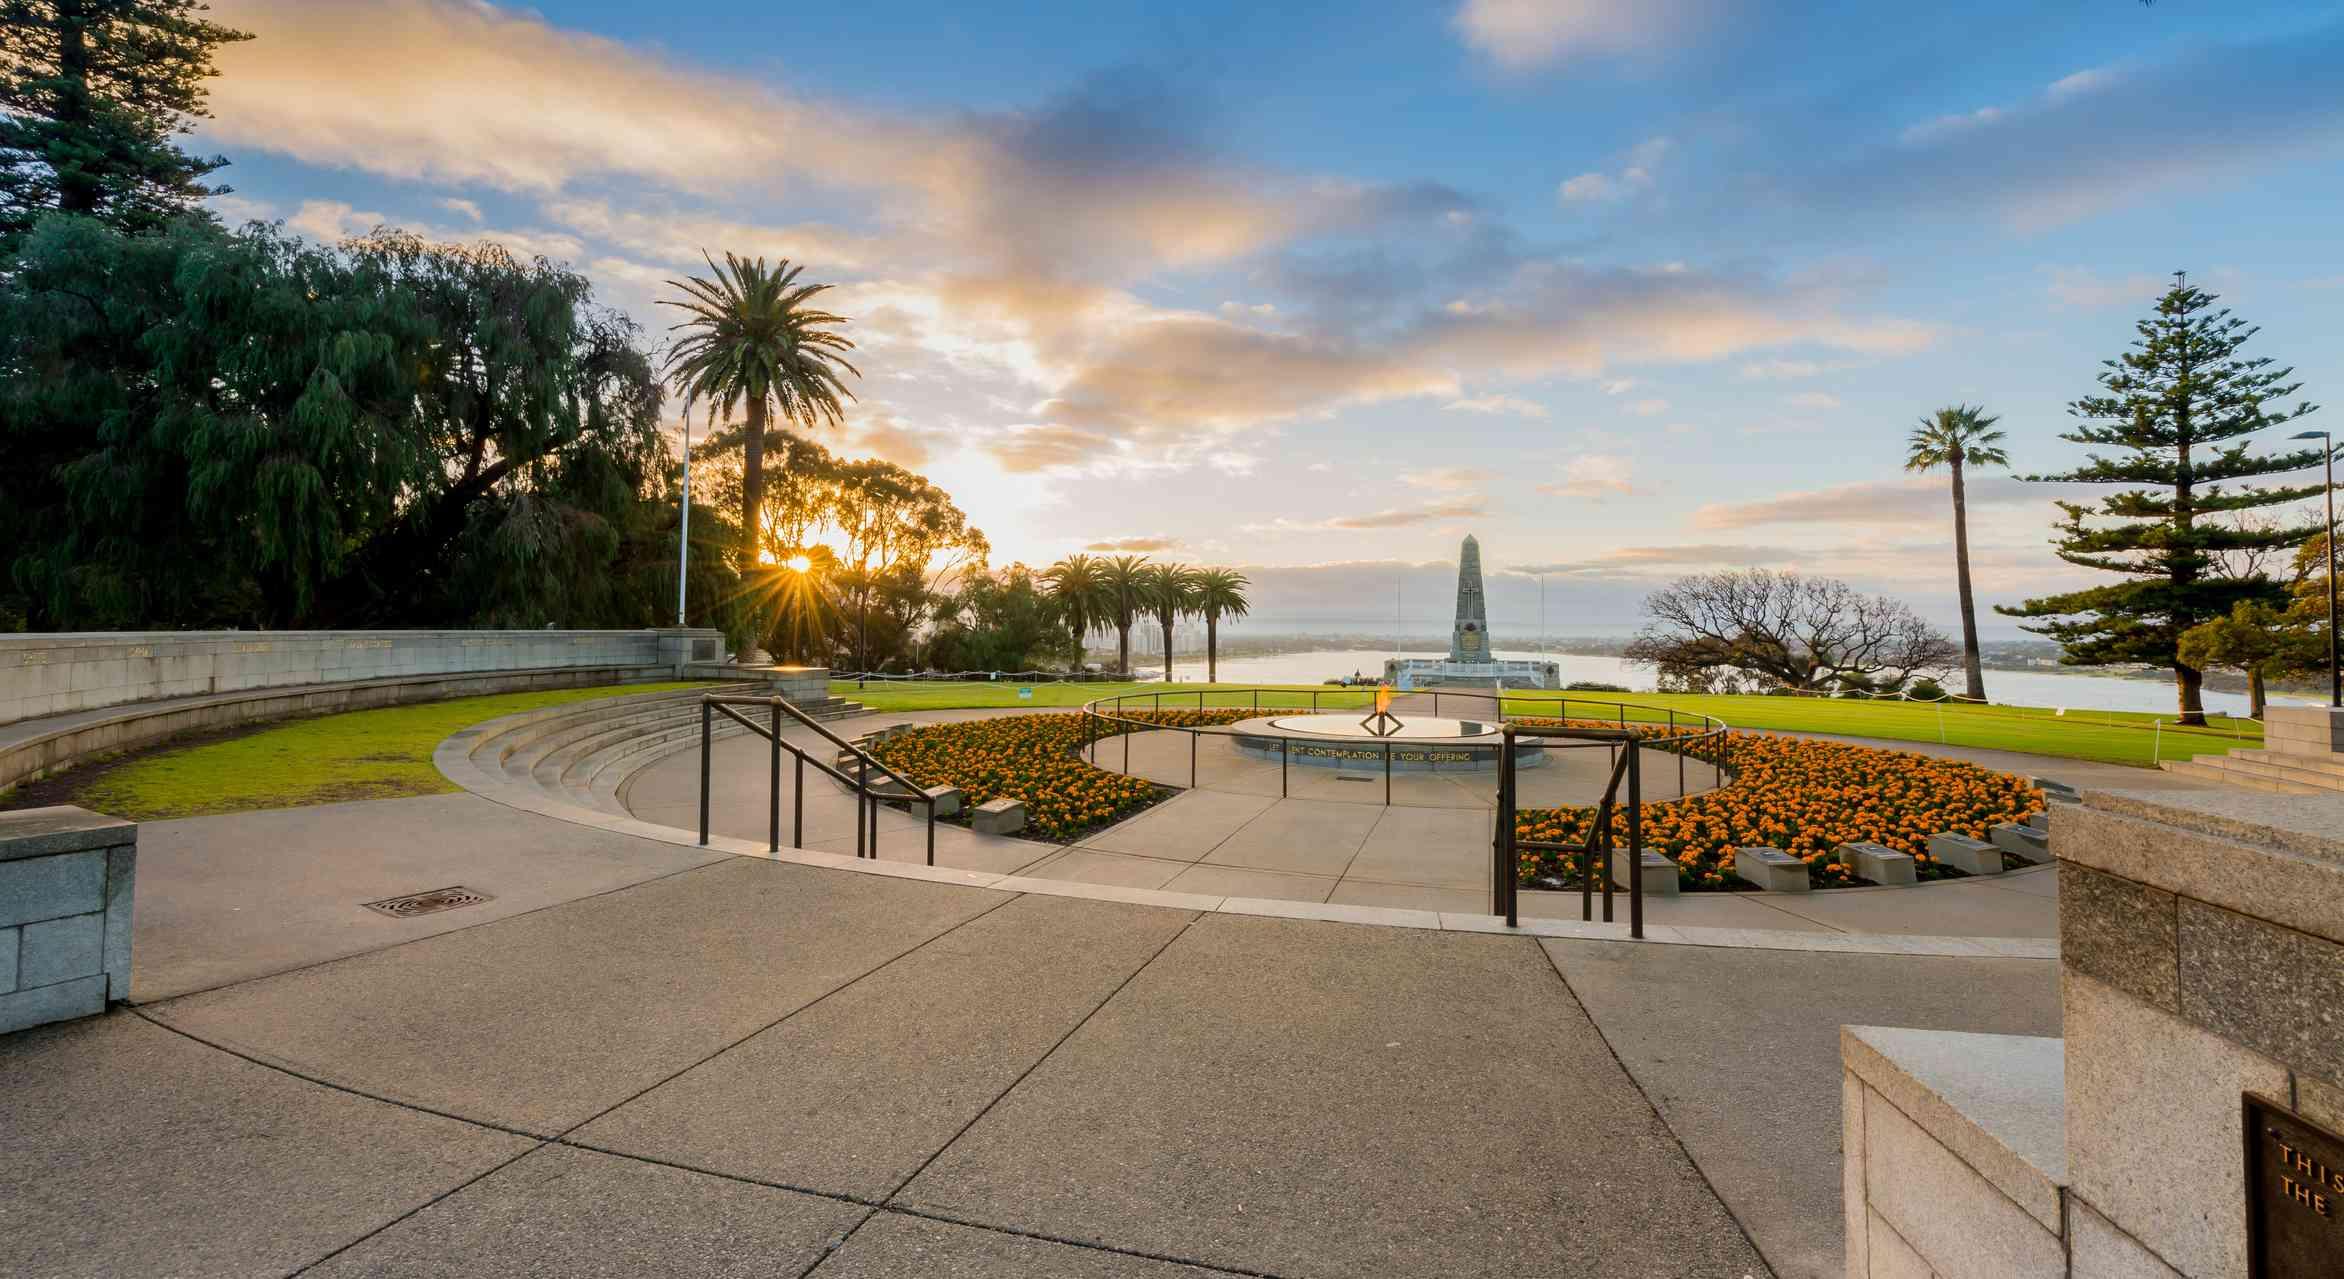 Sunrise at The State war memorial, Perth, Western Australia, Australia